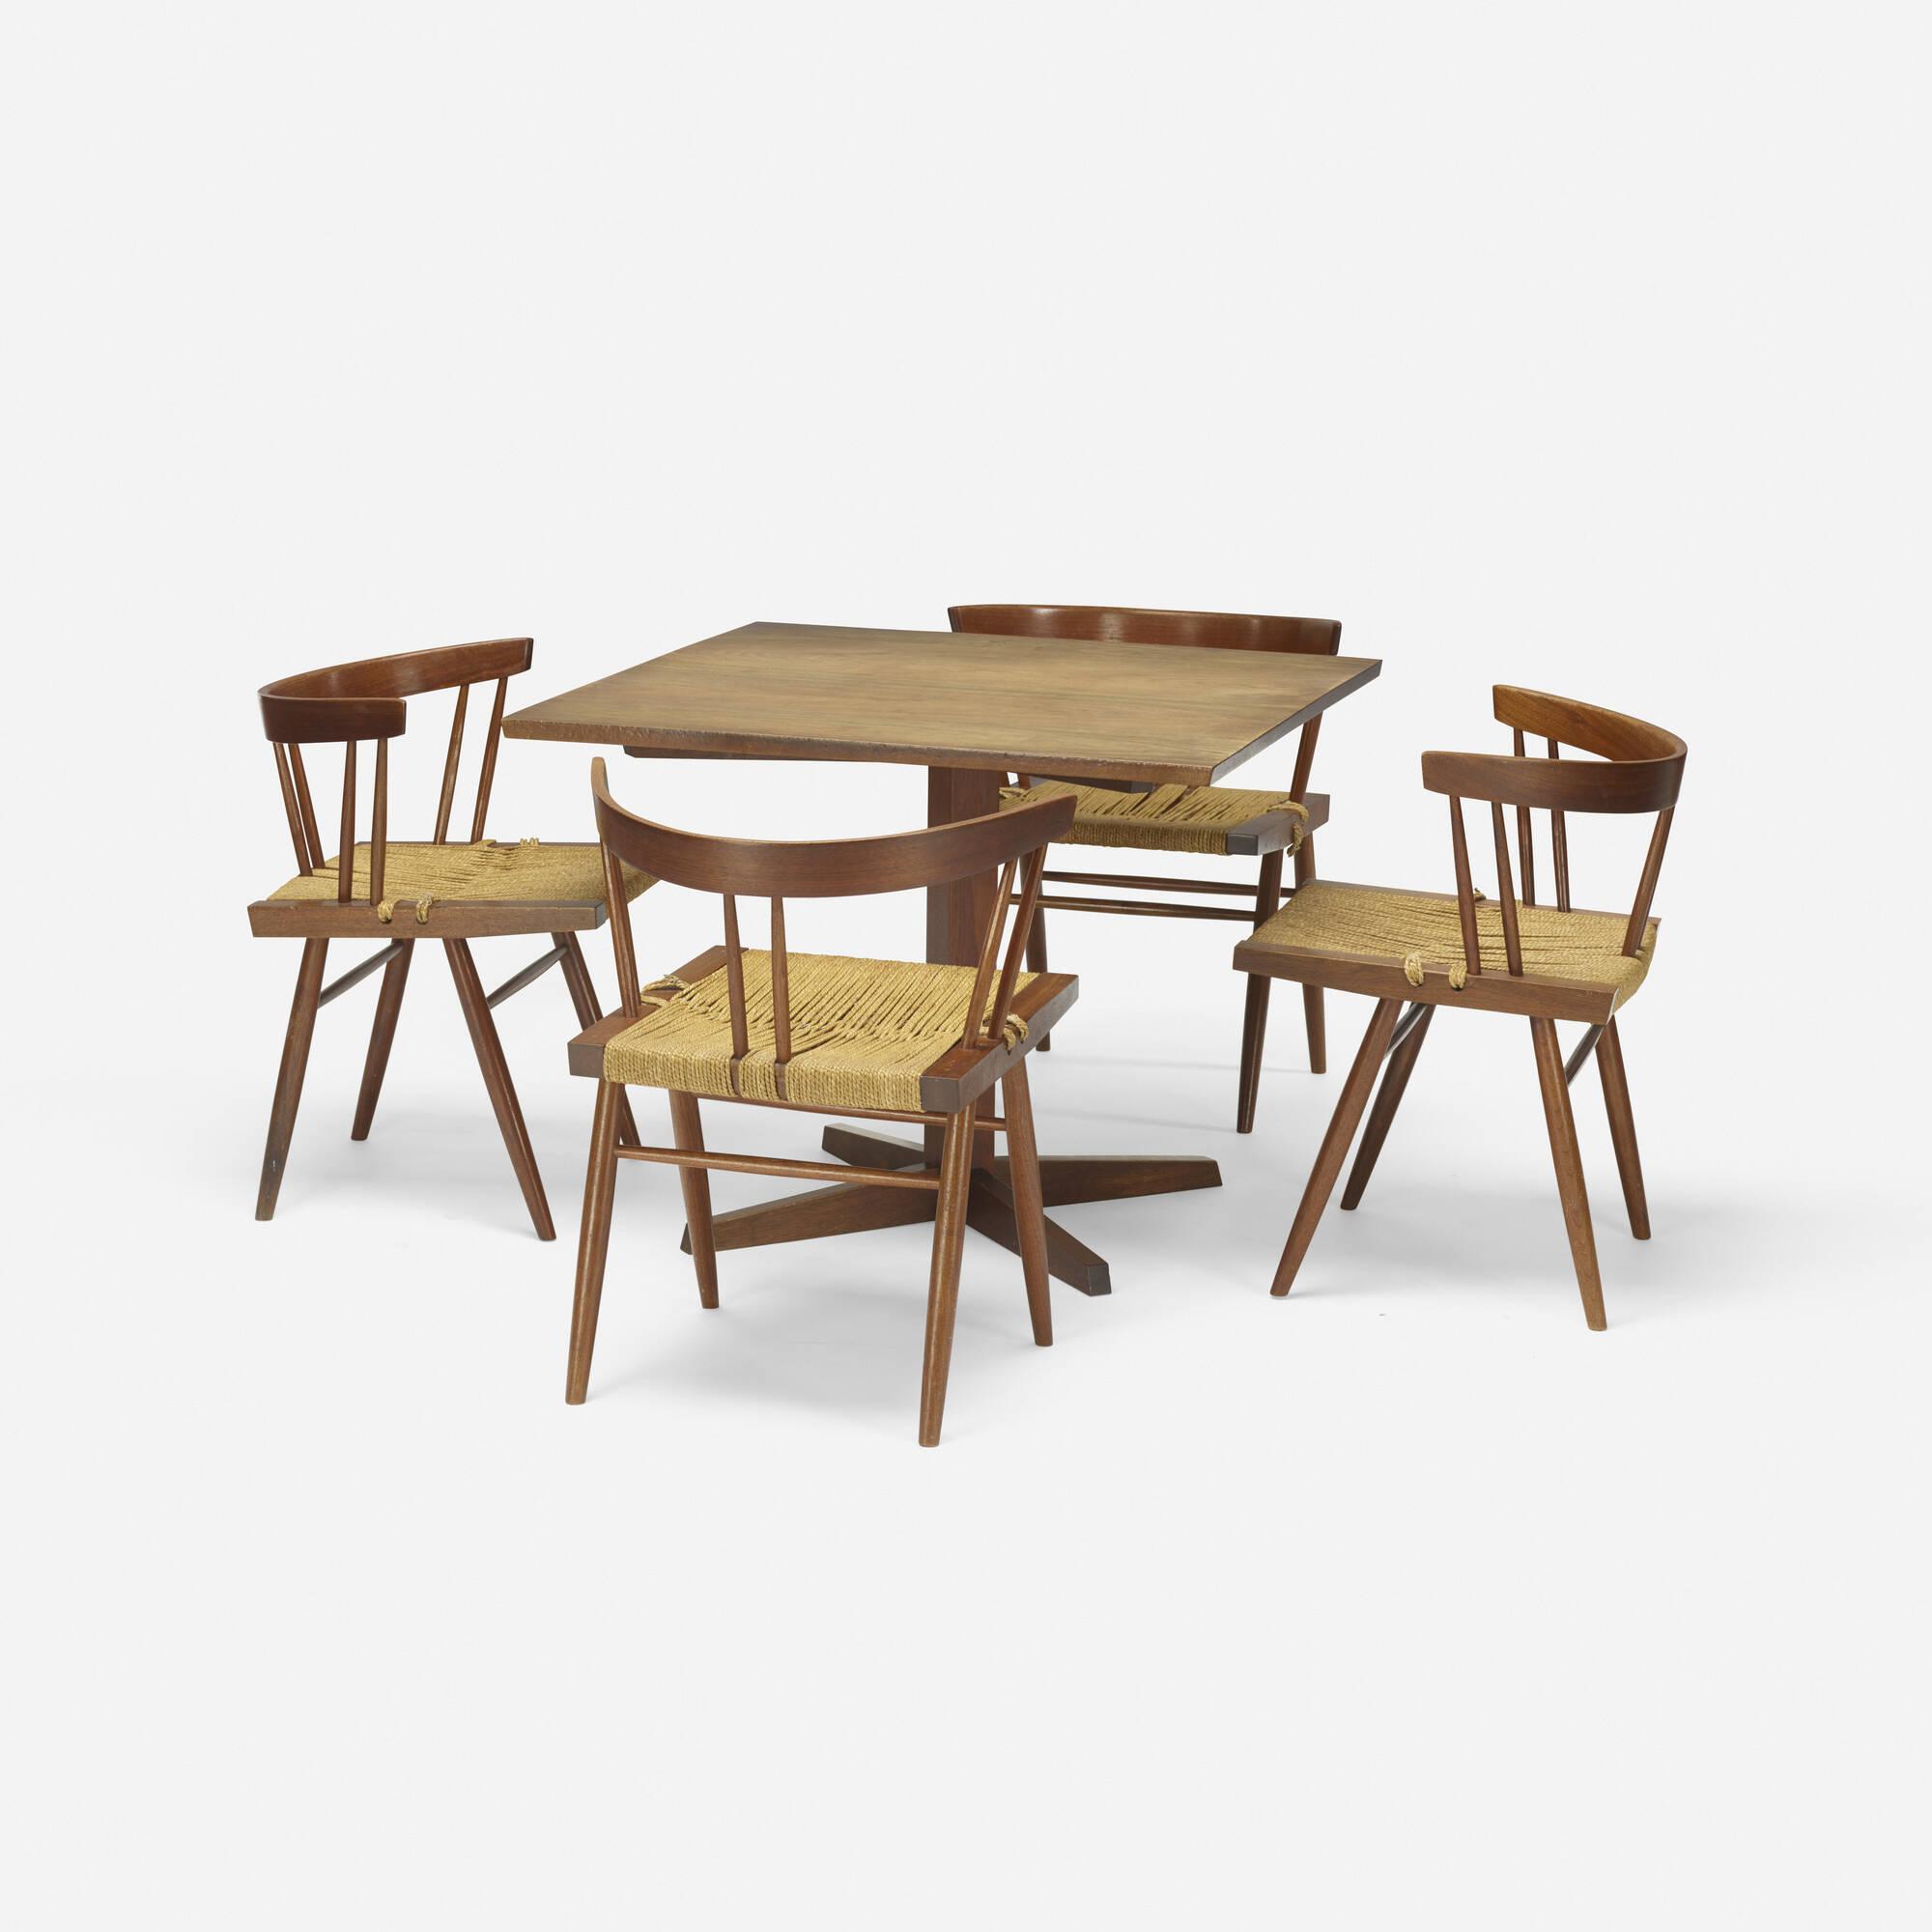 106: George Nakashima / Pedestal table (2 of 2)